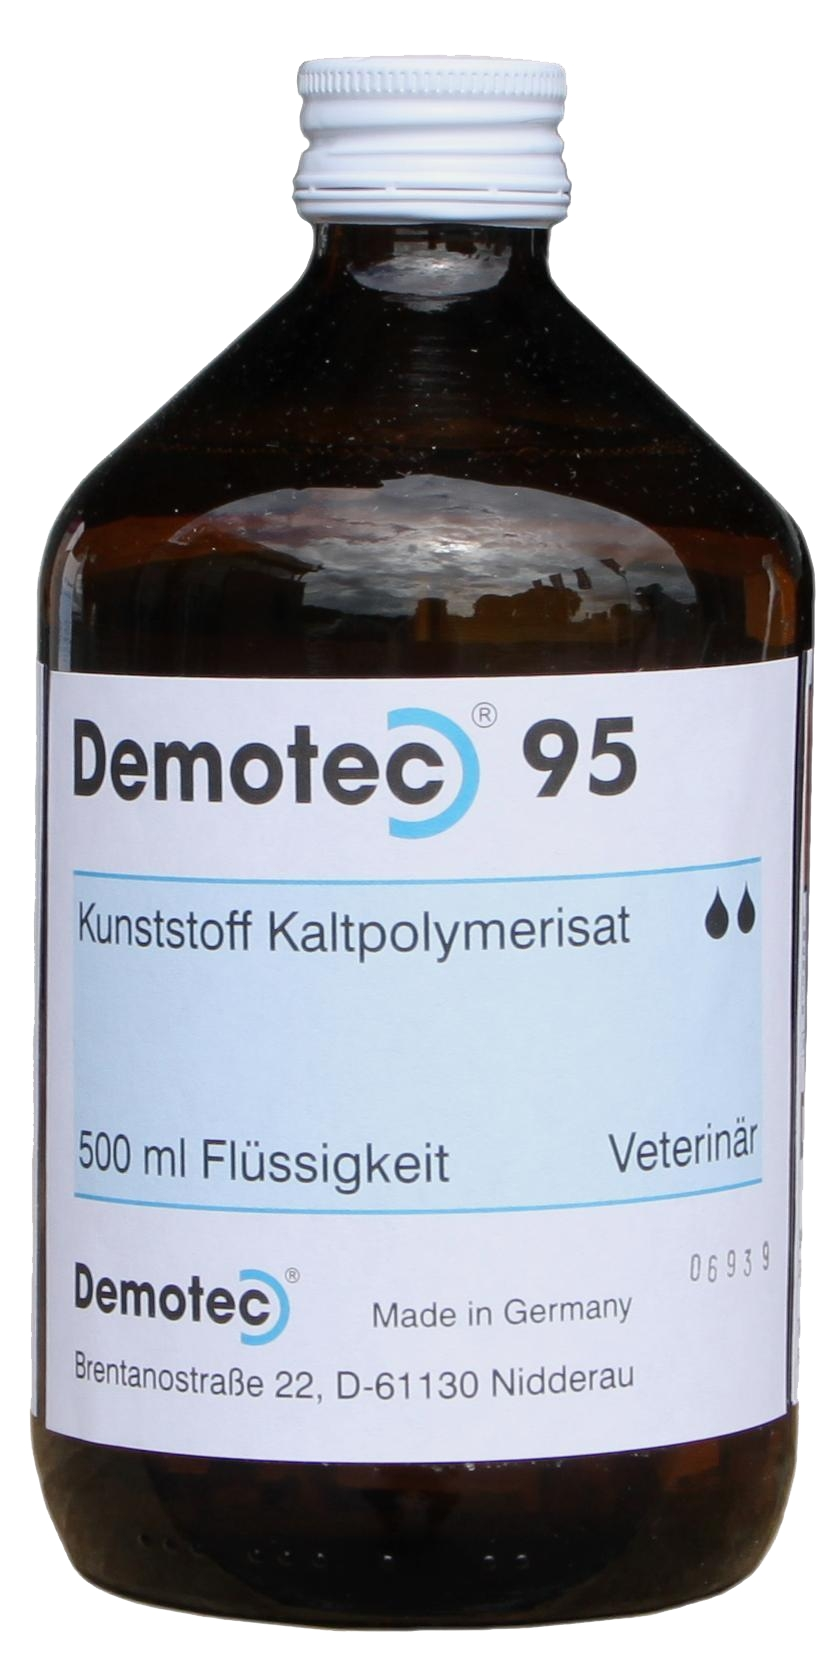 Demotec 95 vloeistof